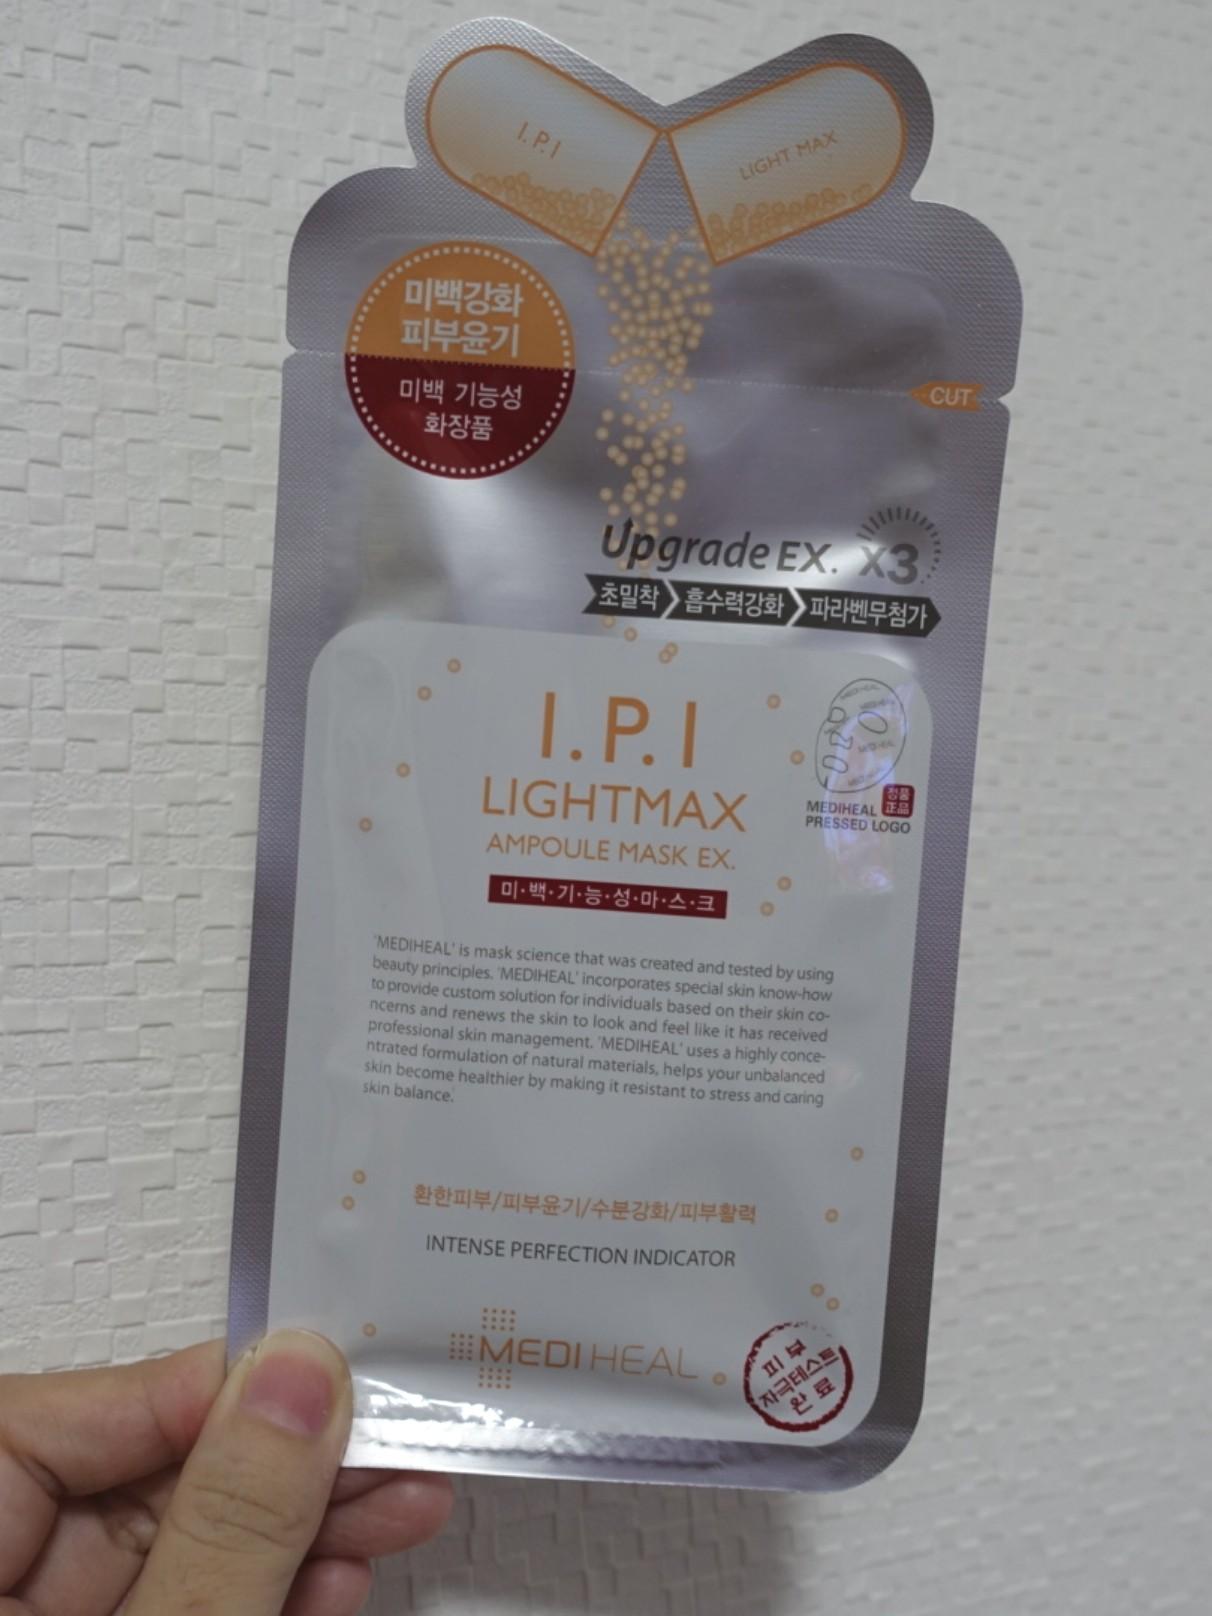 I.P.I ライトマックスアンプルマスクEX